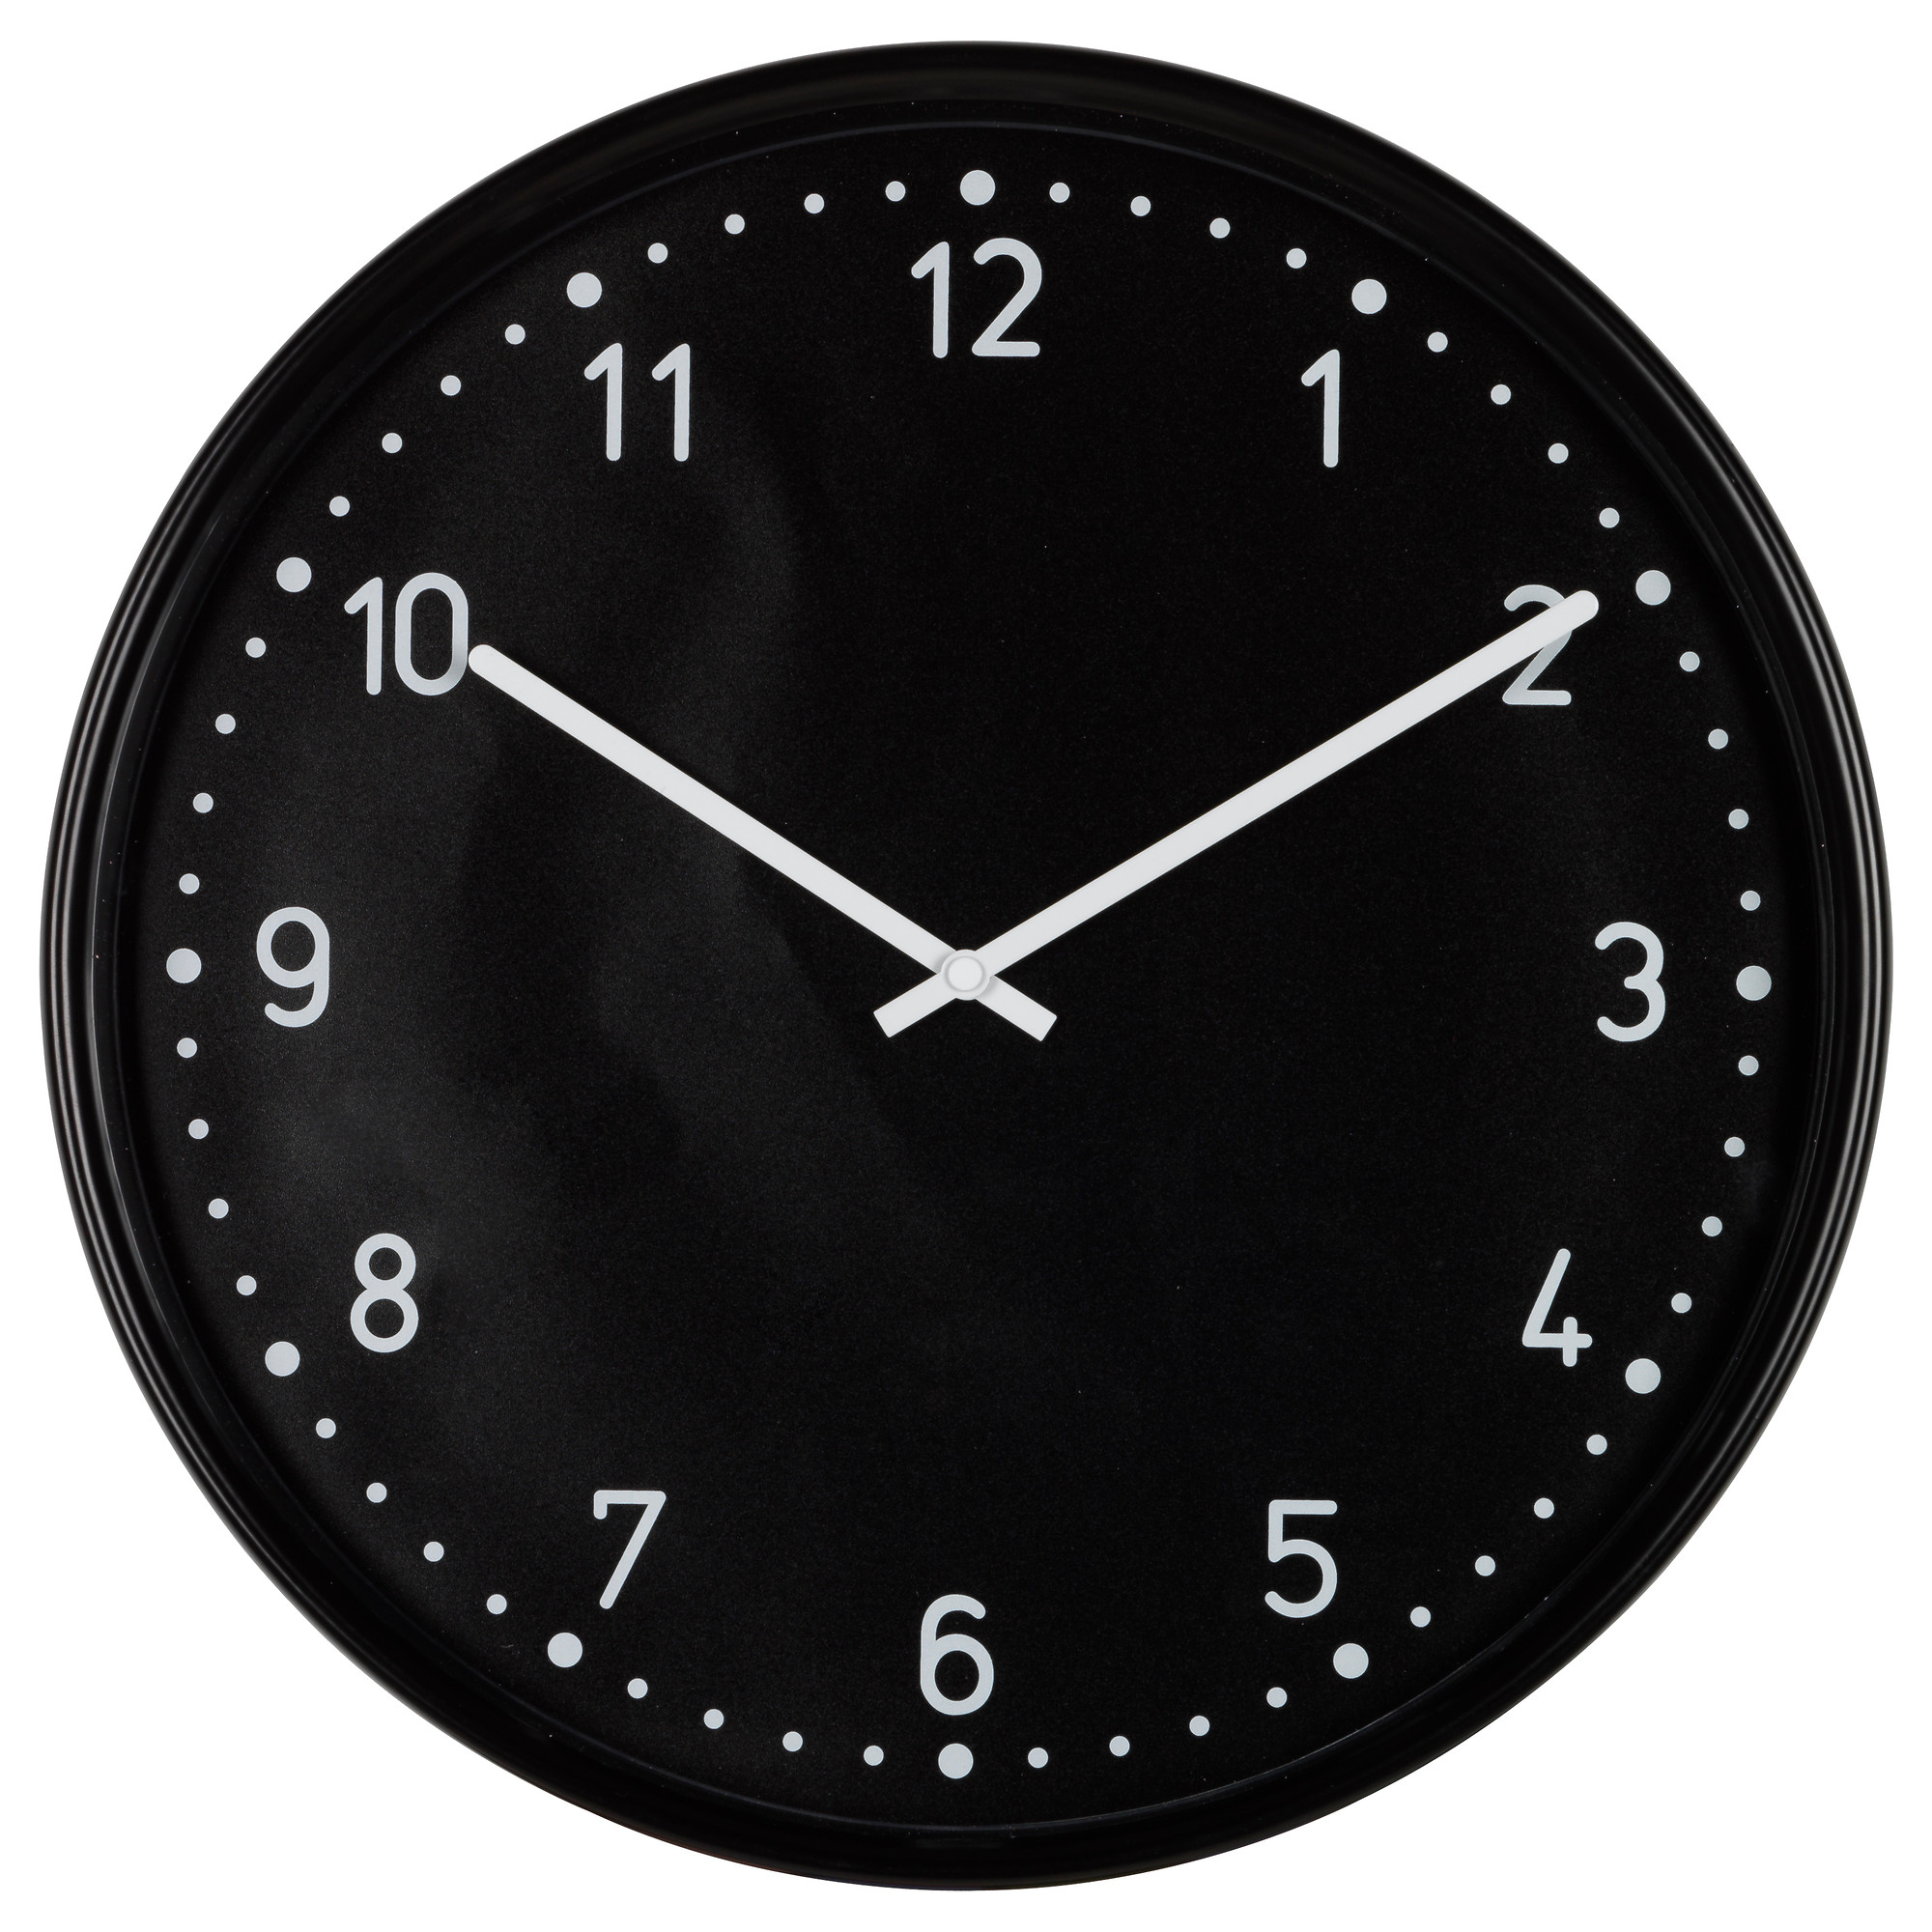 Ikea Bondis clock.JPG